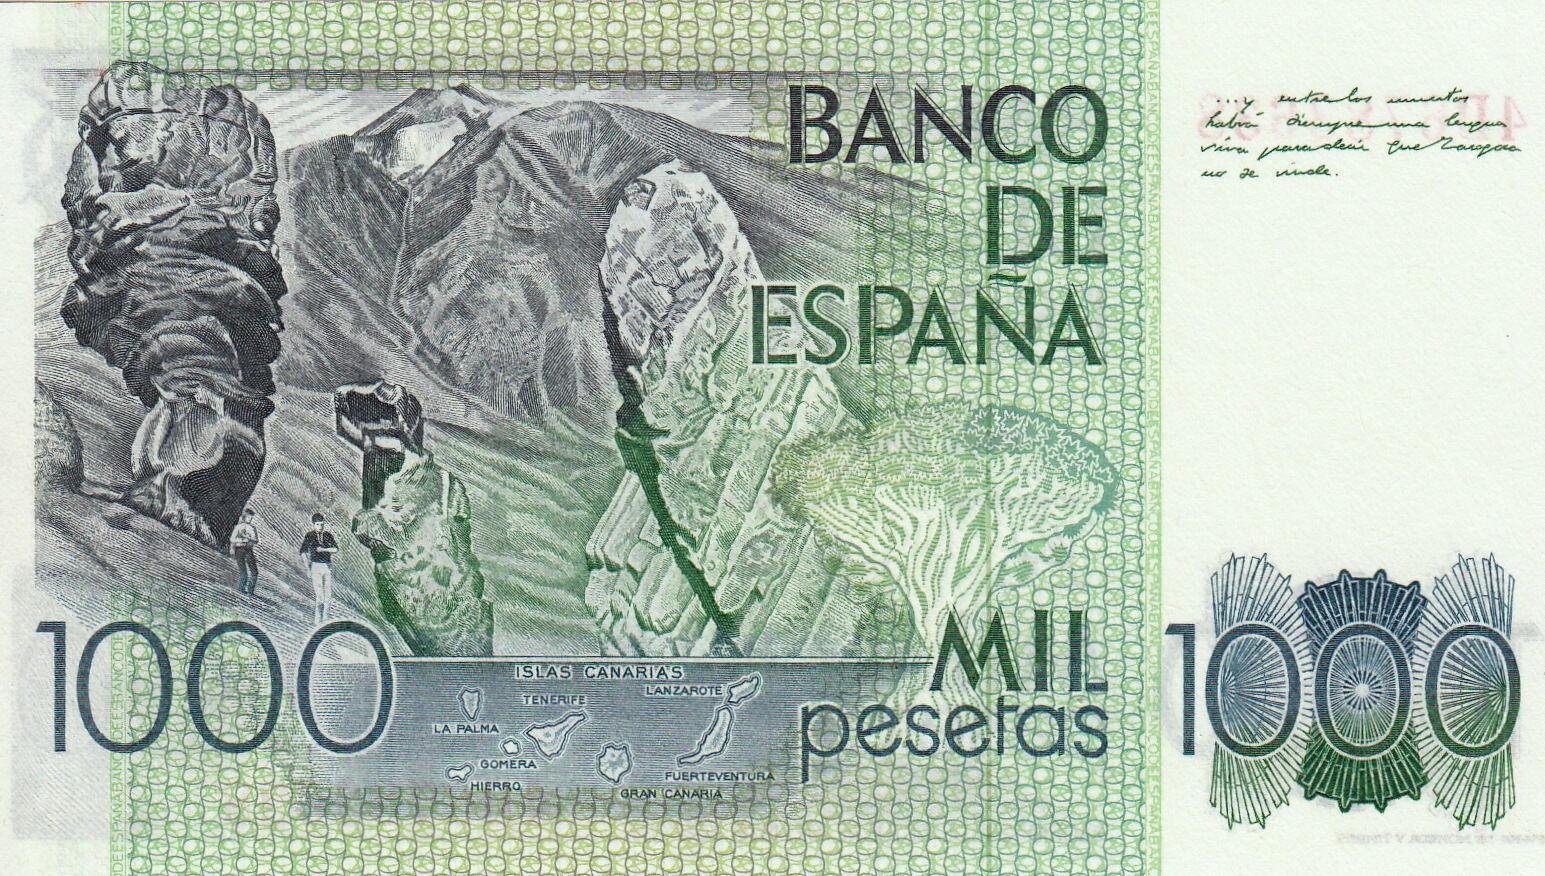 Fotos de billetes de 10000 pesetas 65